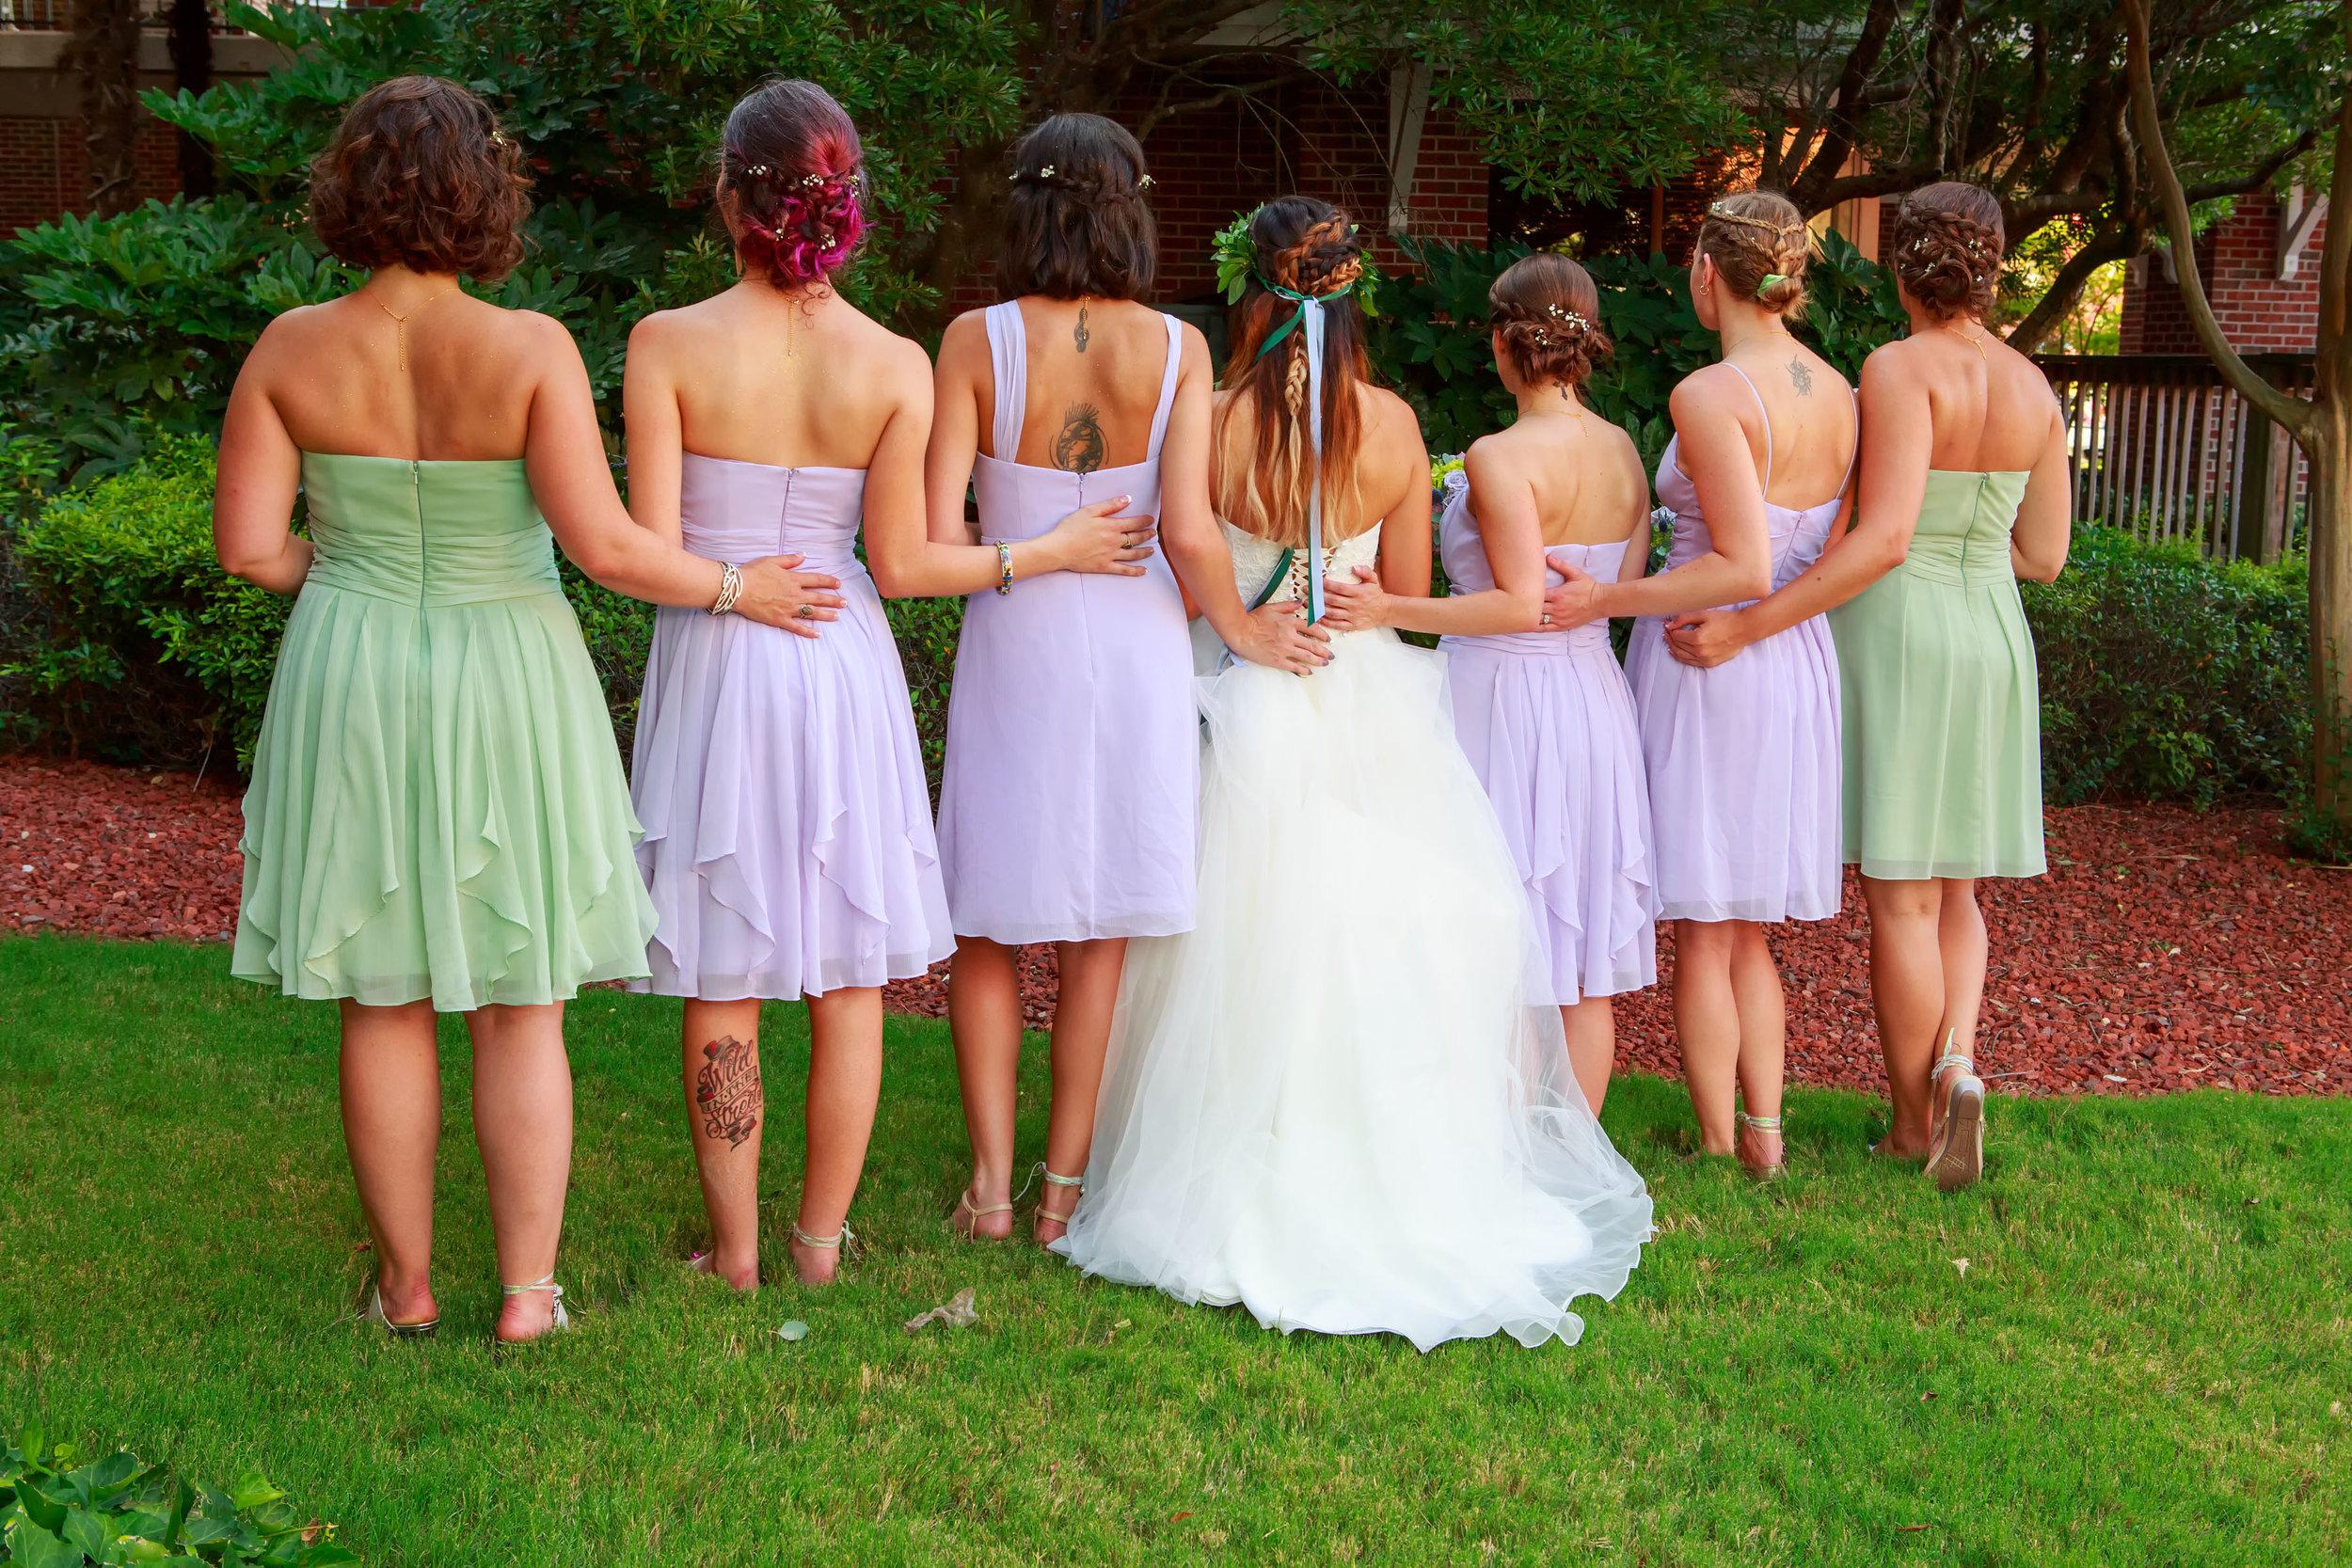 North_Carolina_Wedding_Photographer_Tiffany_Abruzzo_Group_5.jpg